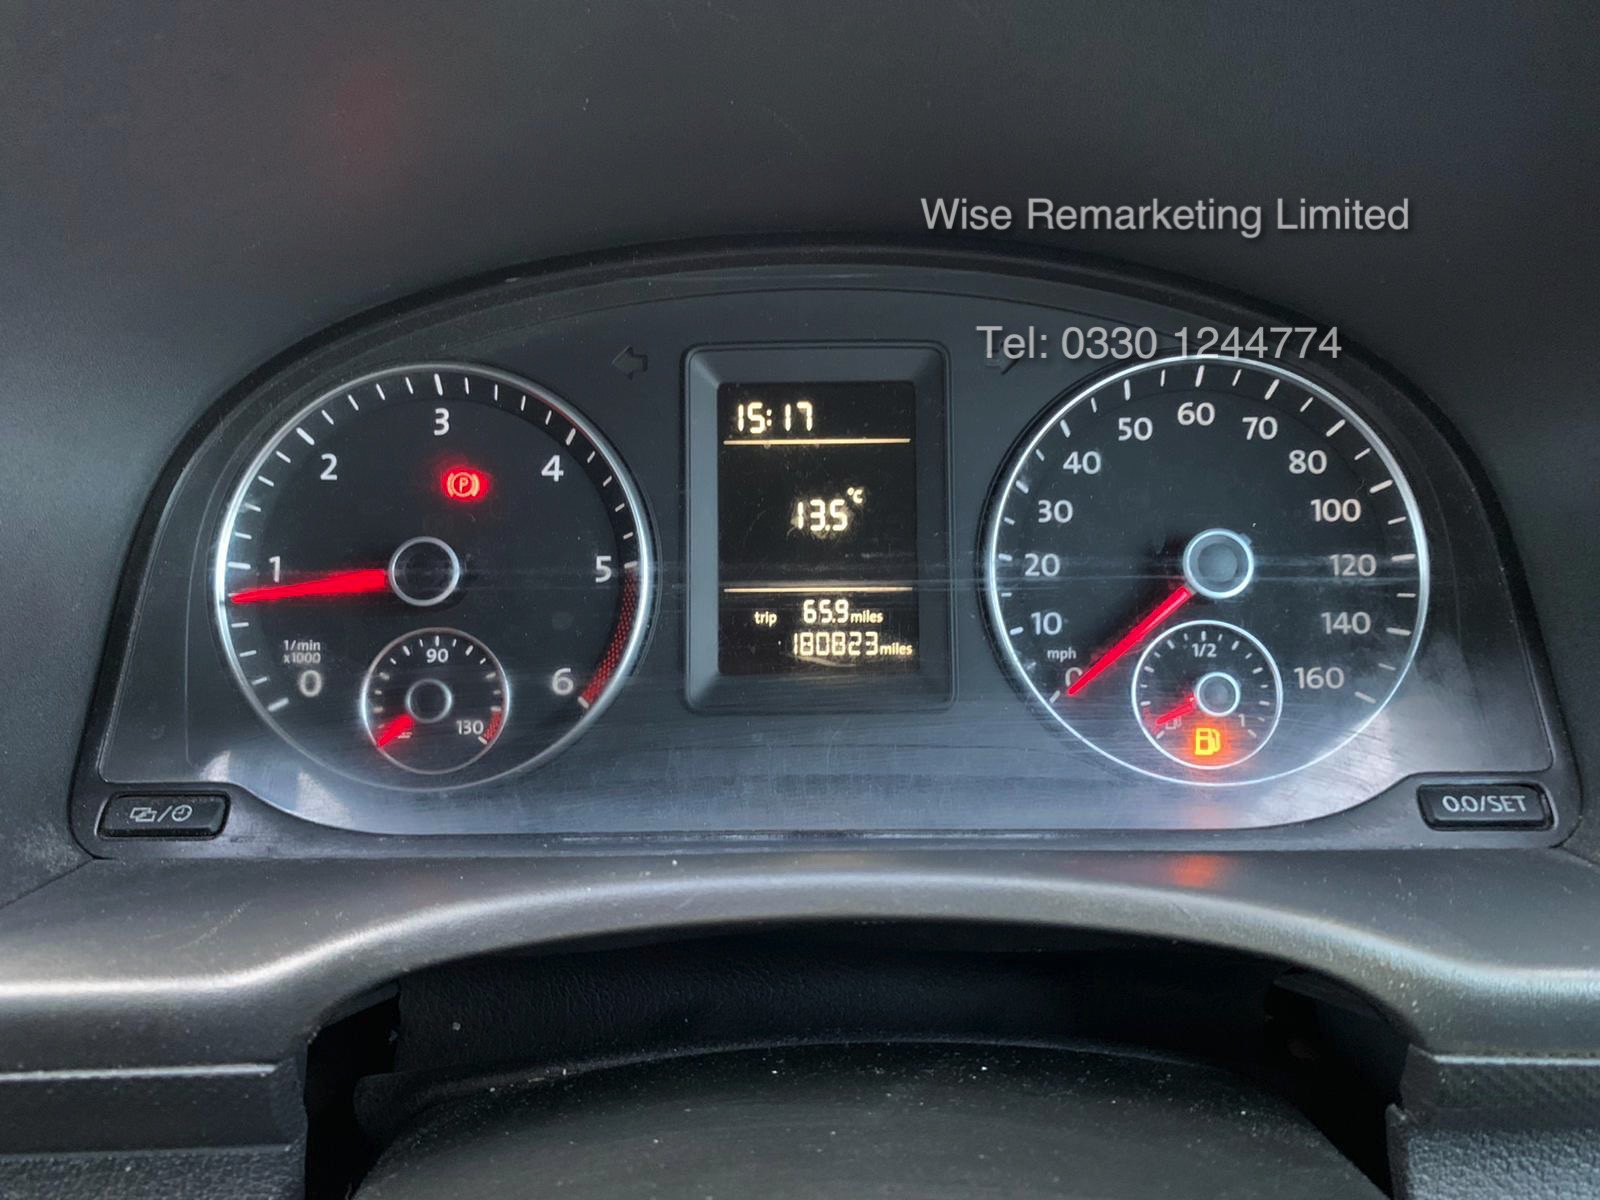 Volkswagen Caddy C20 1.6 TDI - 2013 13 Reg - Silver - Side Loading Door - Ply Lined - Image 18 of 18